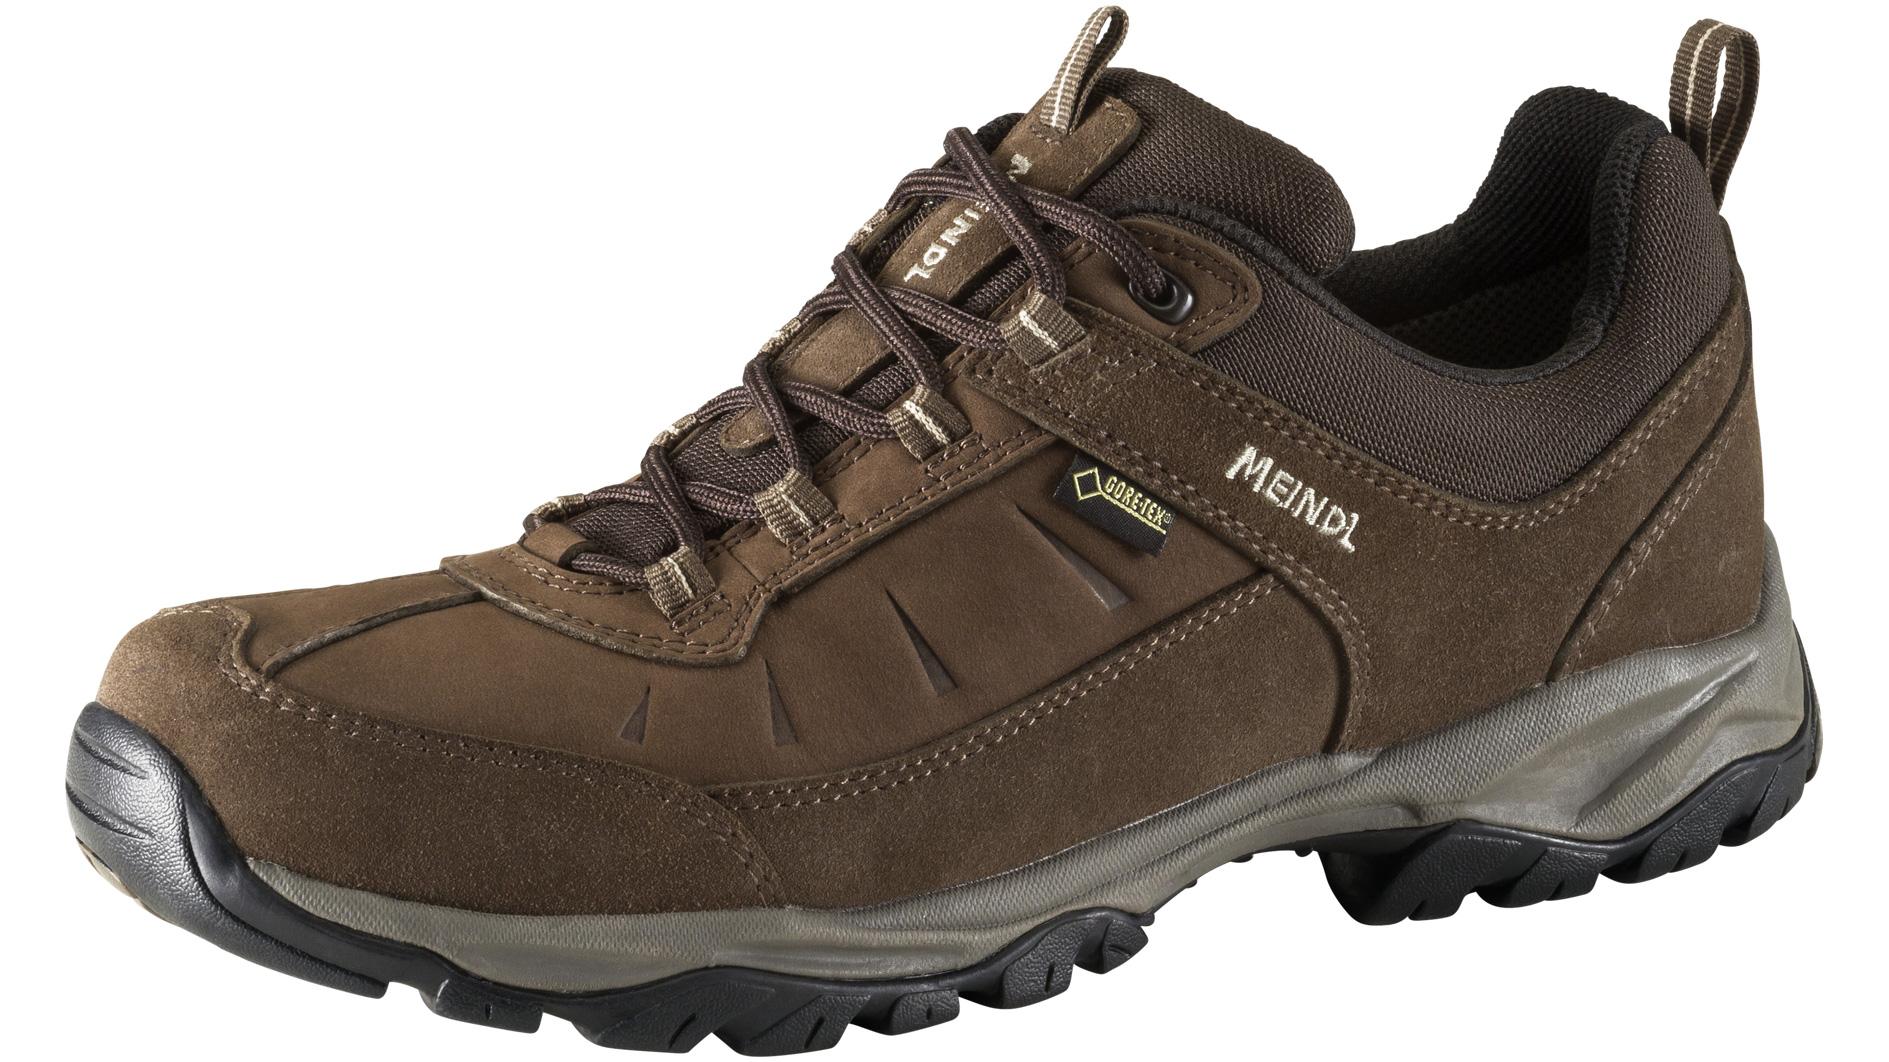 Herren Multifunktions-Schuhe Eifel GTX M